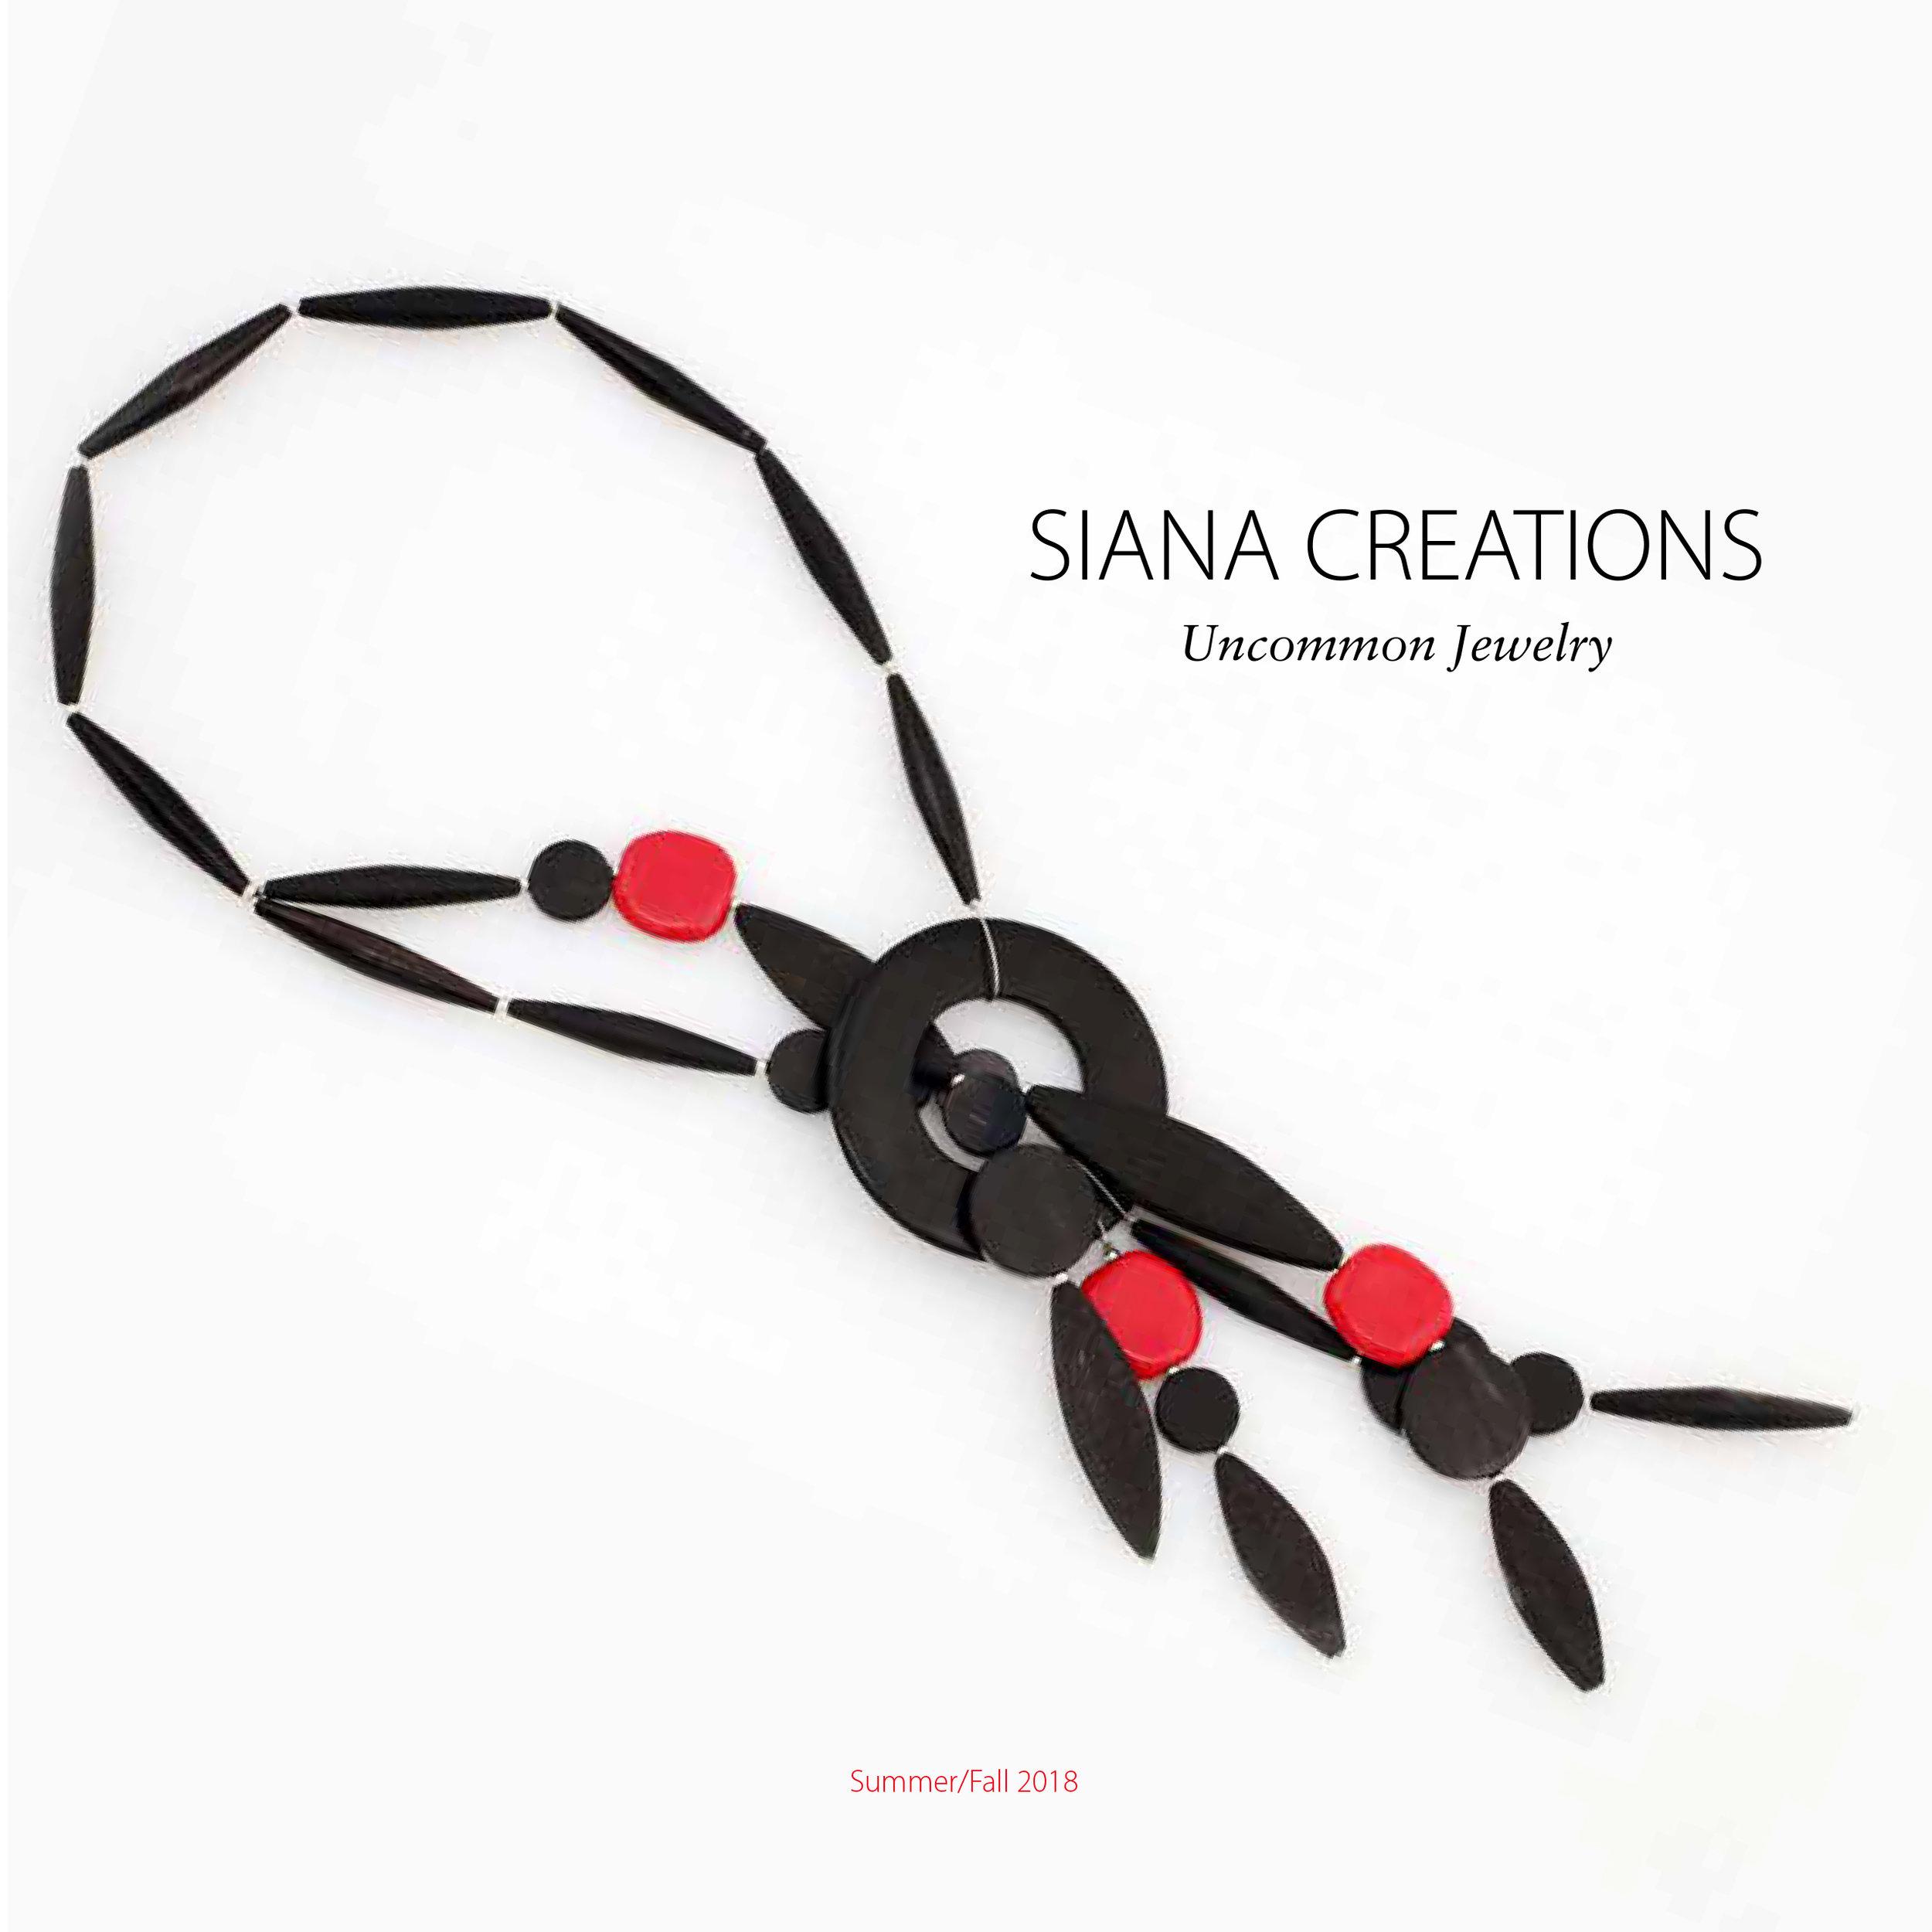 SIANAcatalogJuly2018_retail-Cover.jpg